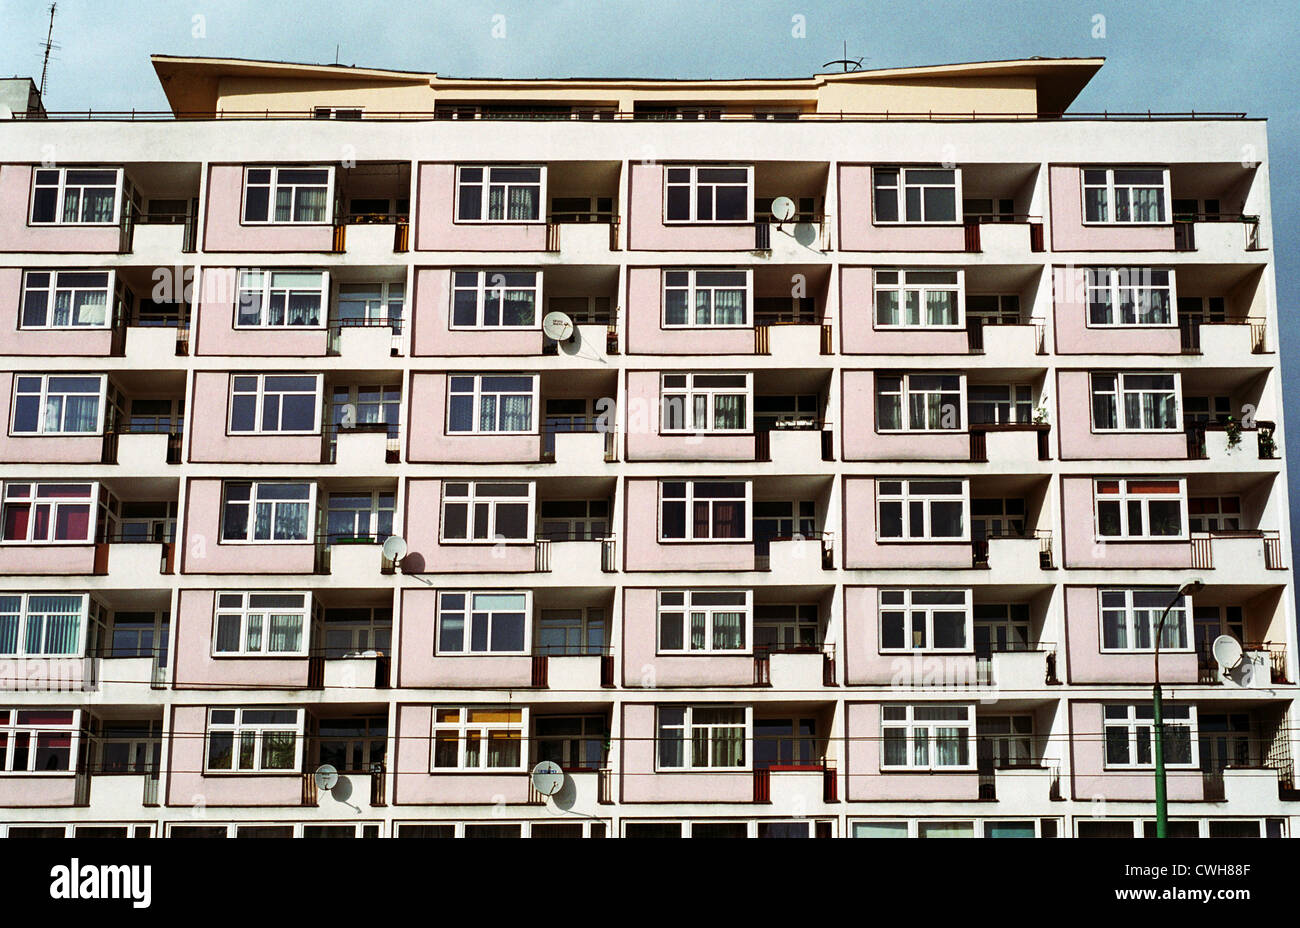 Apartment block in Posen (Poznan), Poland - Stock Image